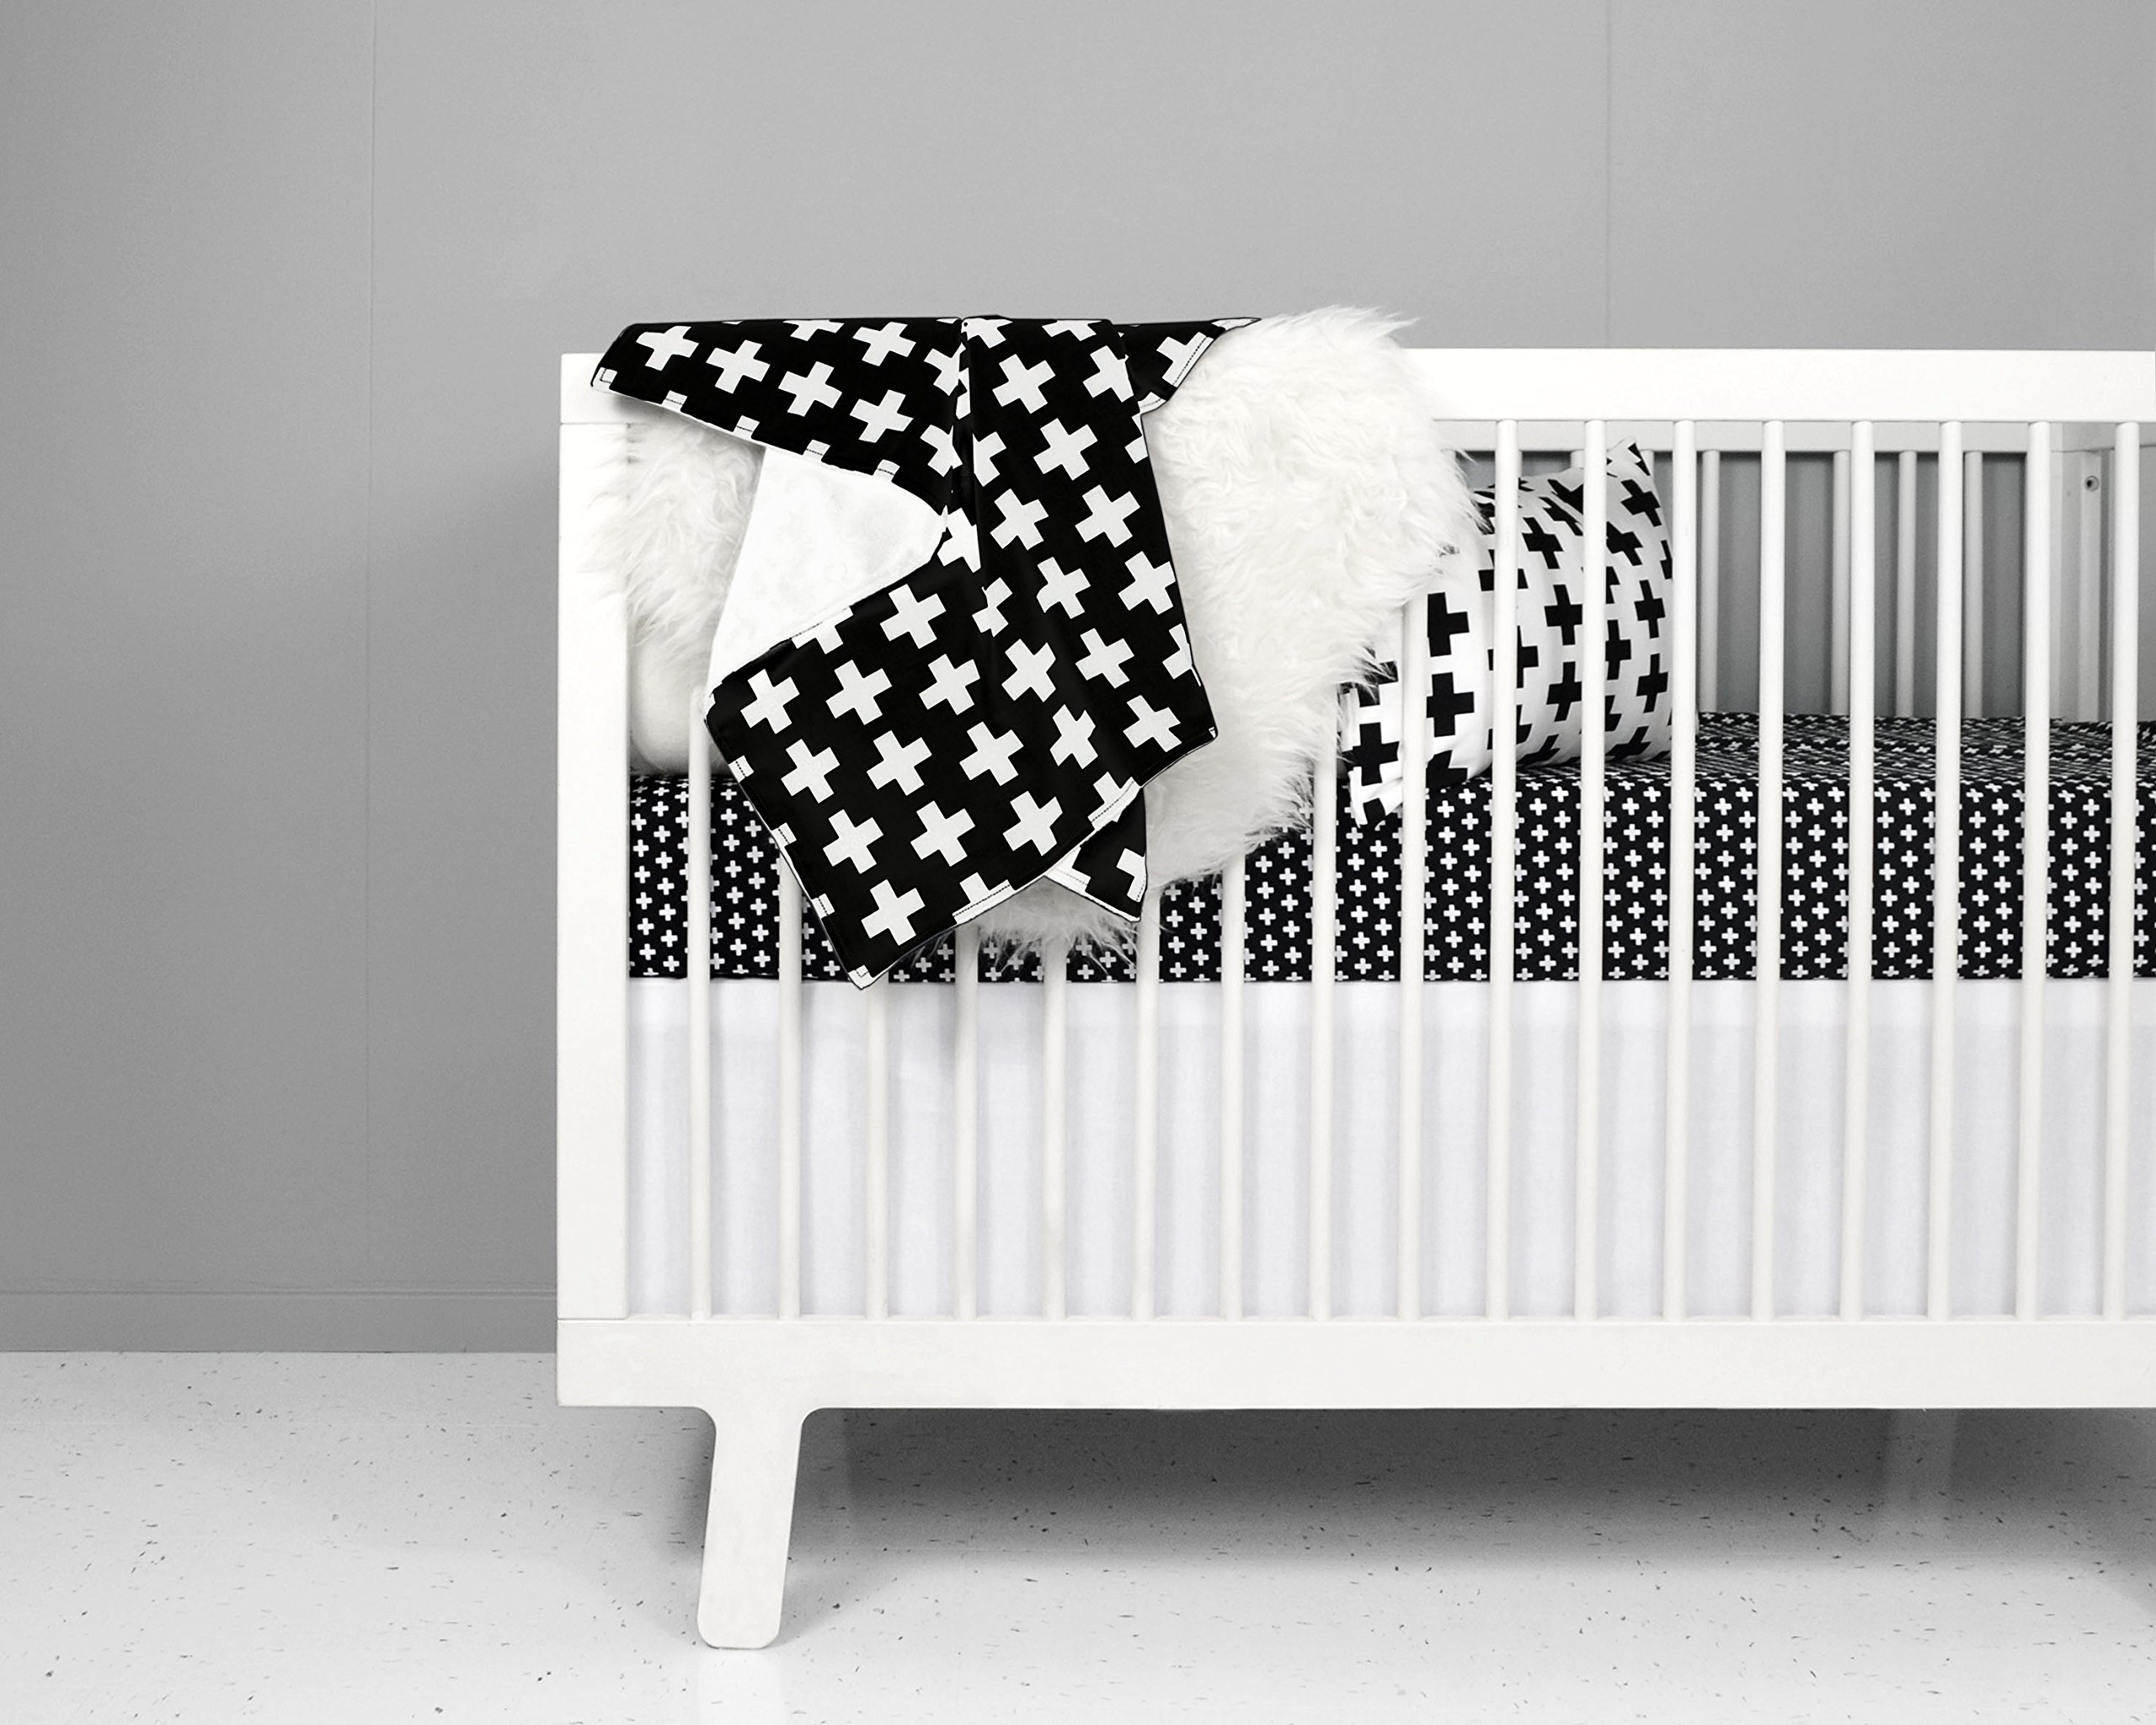 Crib Bedding Set - Nordic Cross design in Black and White